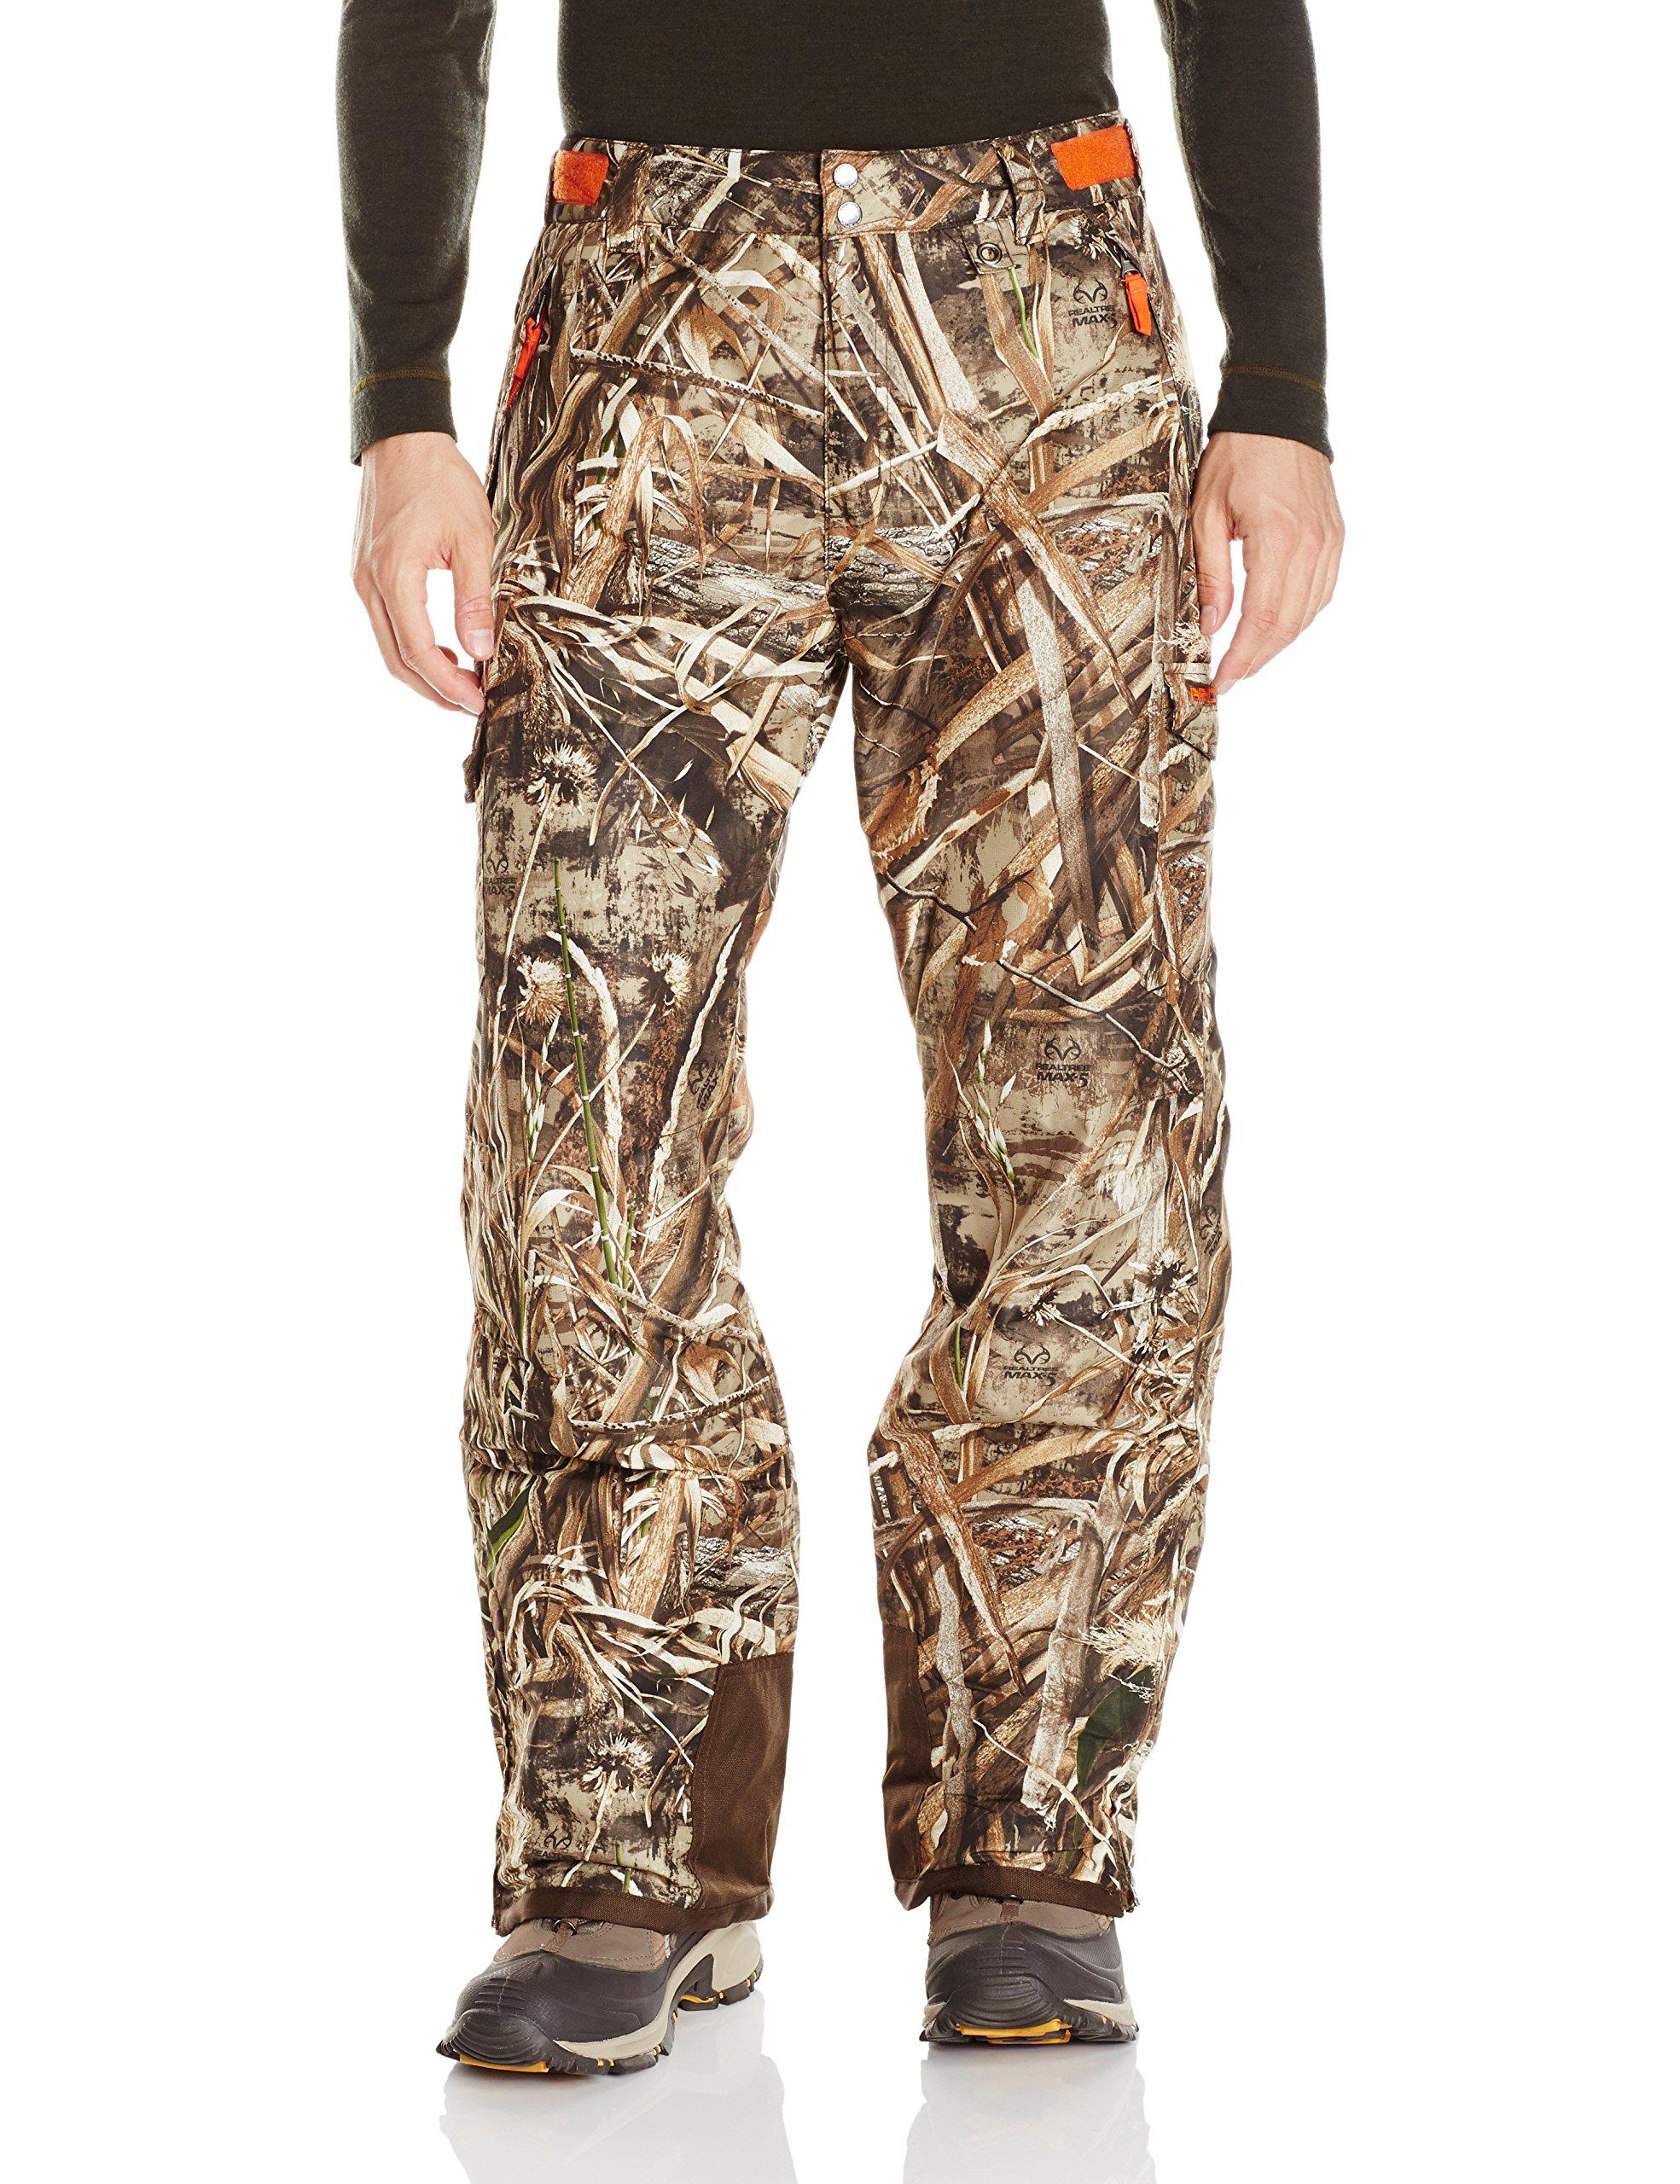 Arctix Men's Snow Sports Cargo Pants, Realtree MAX-5 Camo, Small/Regular by Arctix